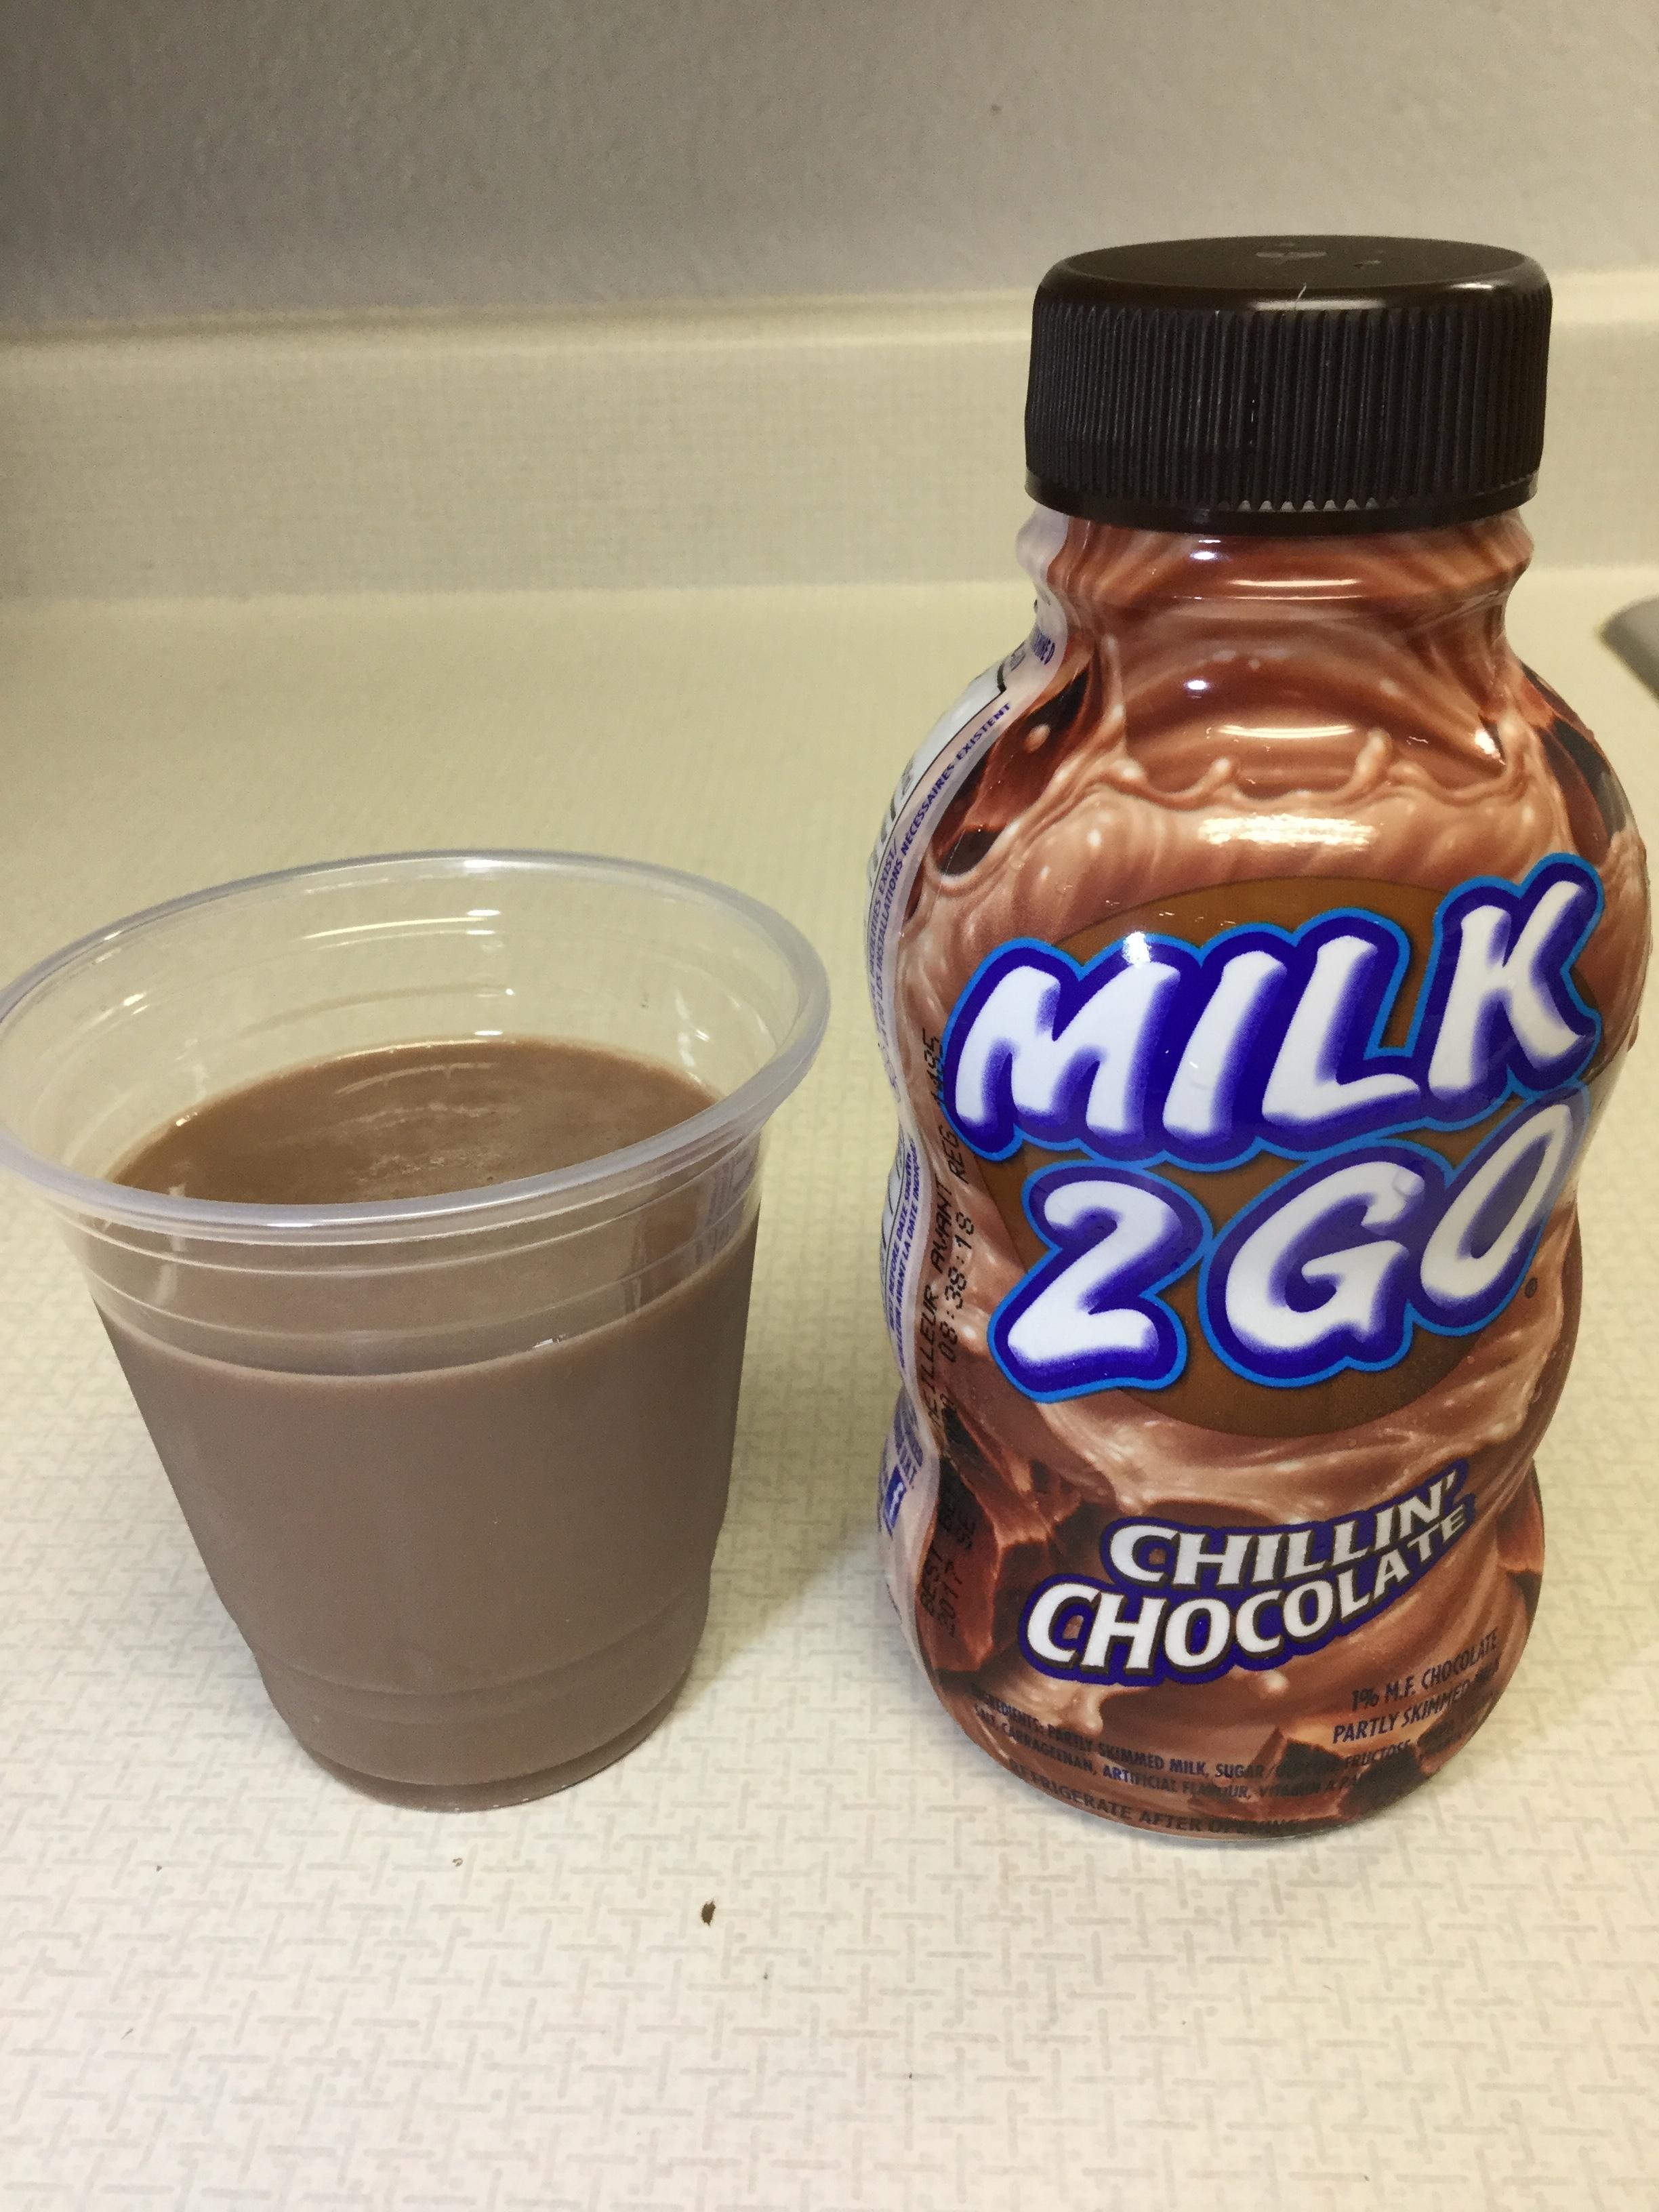 Saputo Milk 2 Go Chillin' Chocolate Cup